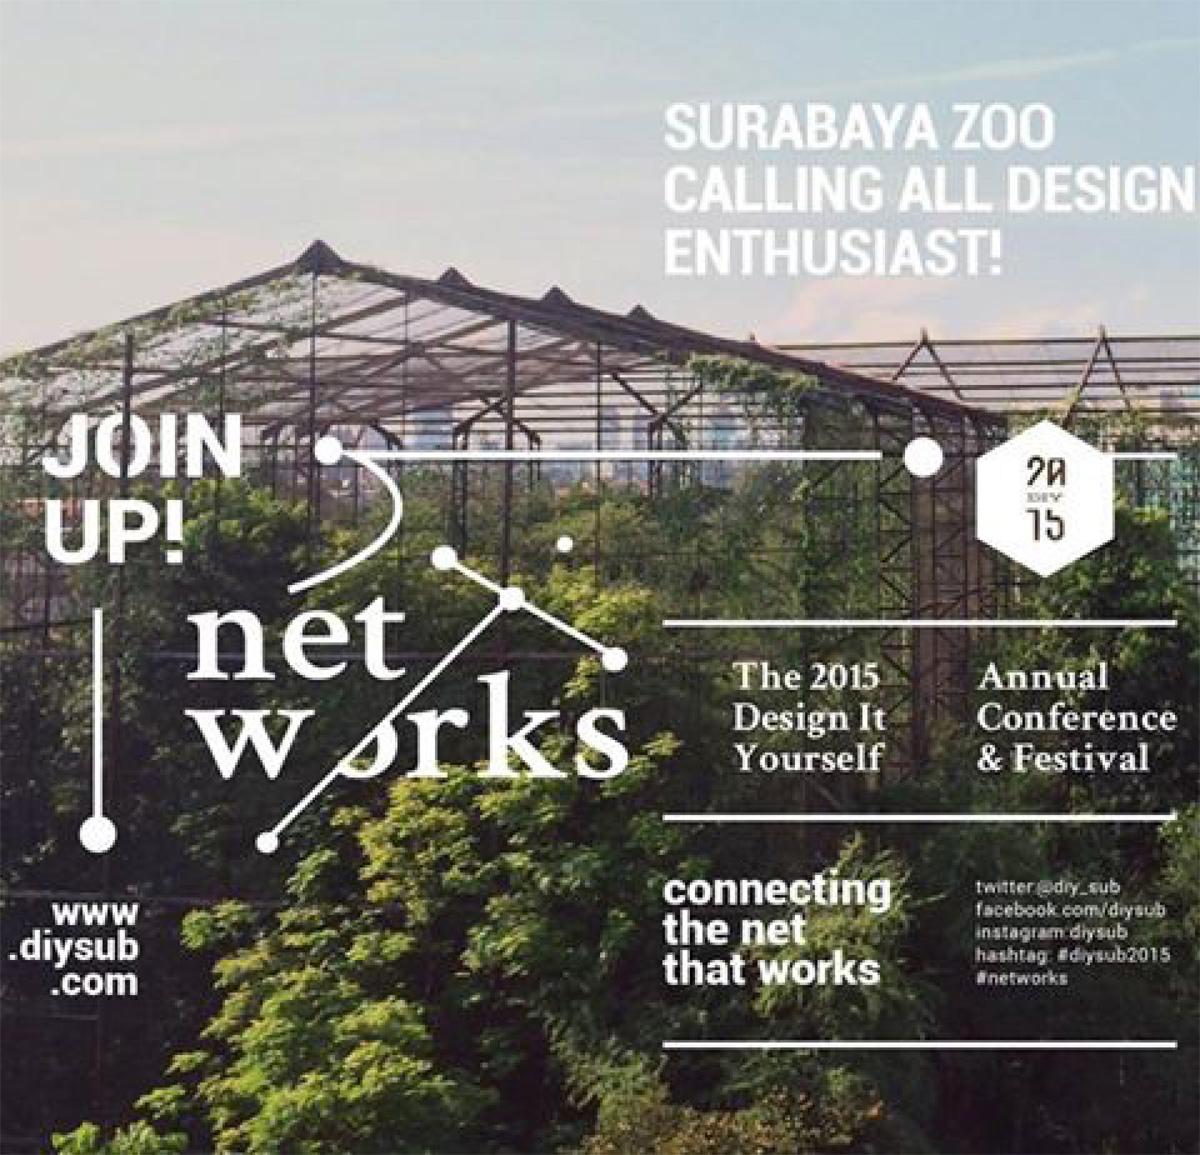 DGIDGDPD-Tur-Surabaya-21